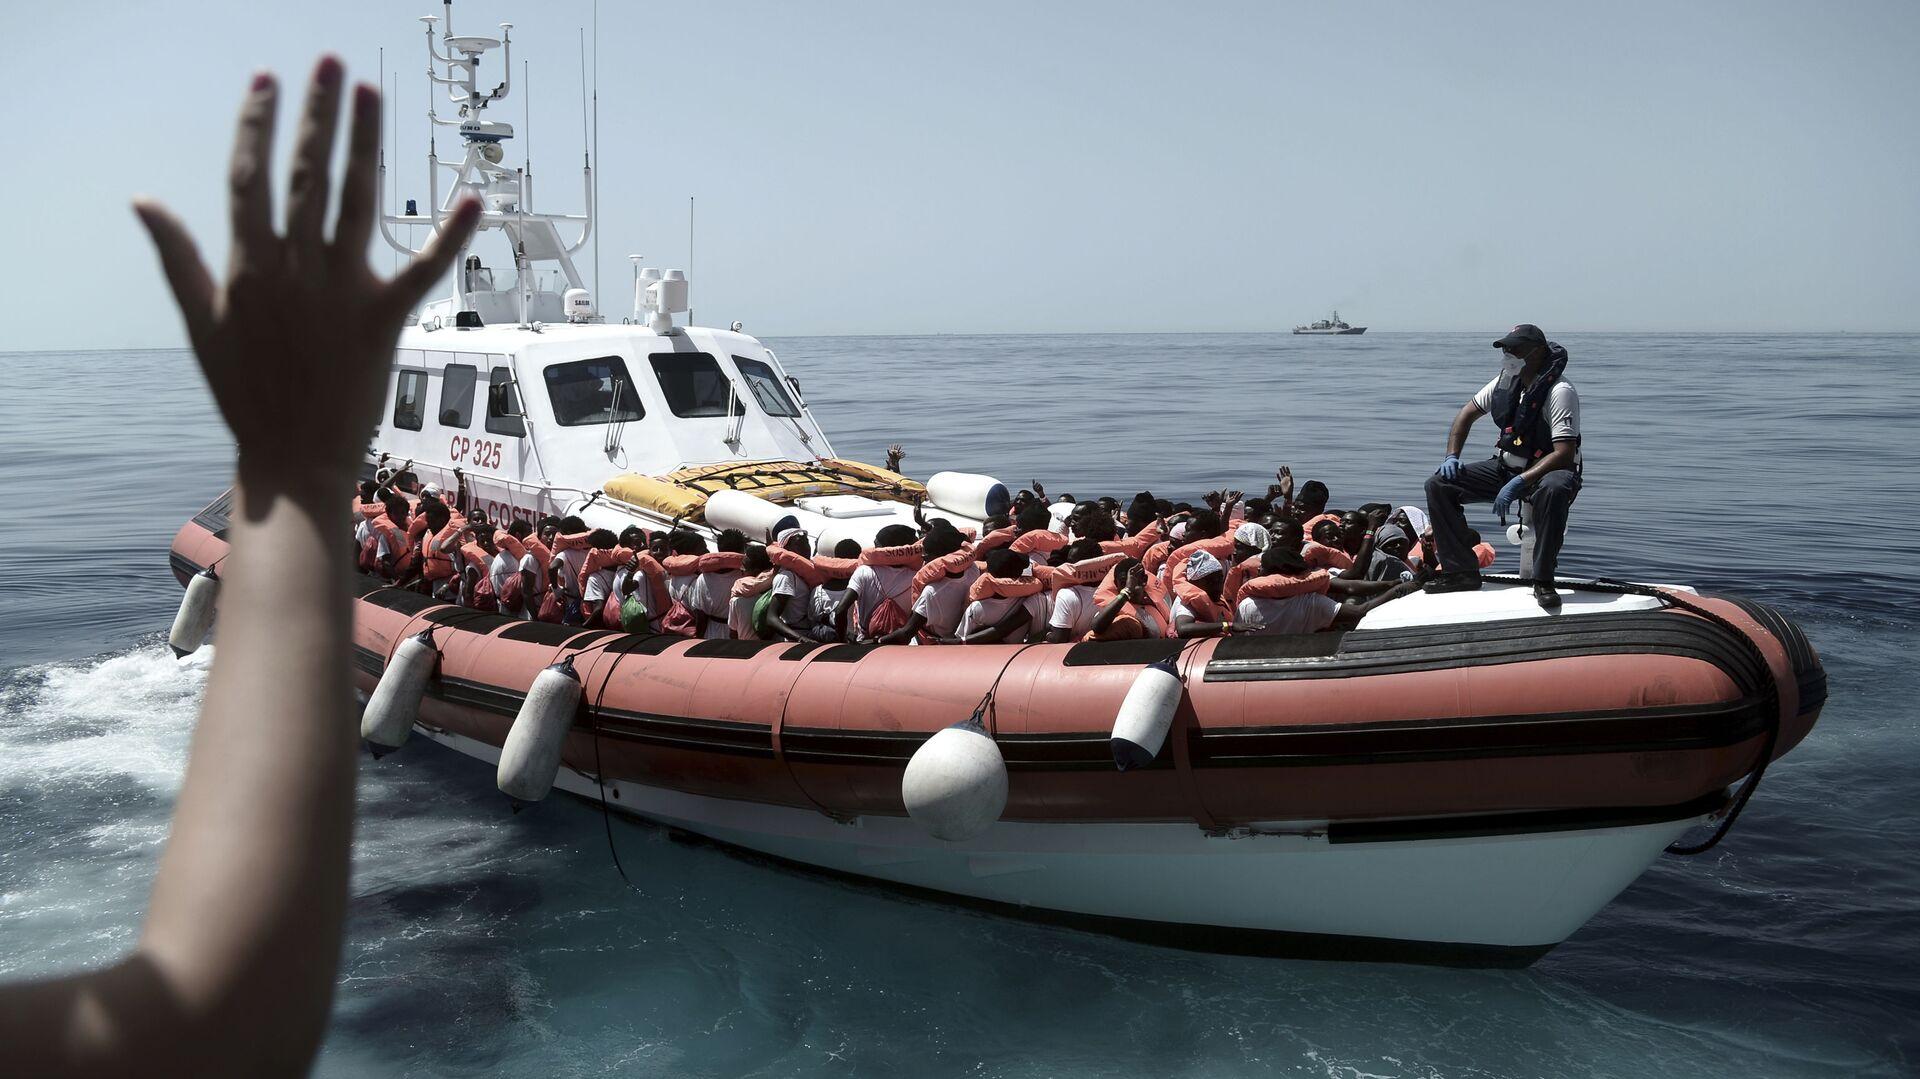 Migranti nel Mar Mediterraneo - Sputnik Italia, 1920, 21.08.2021